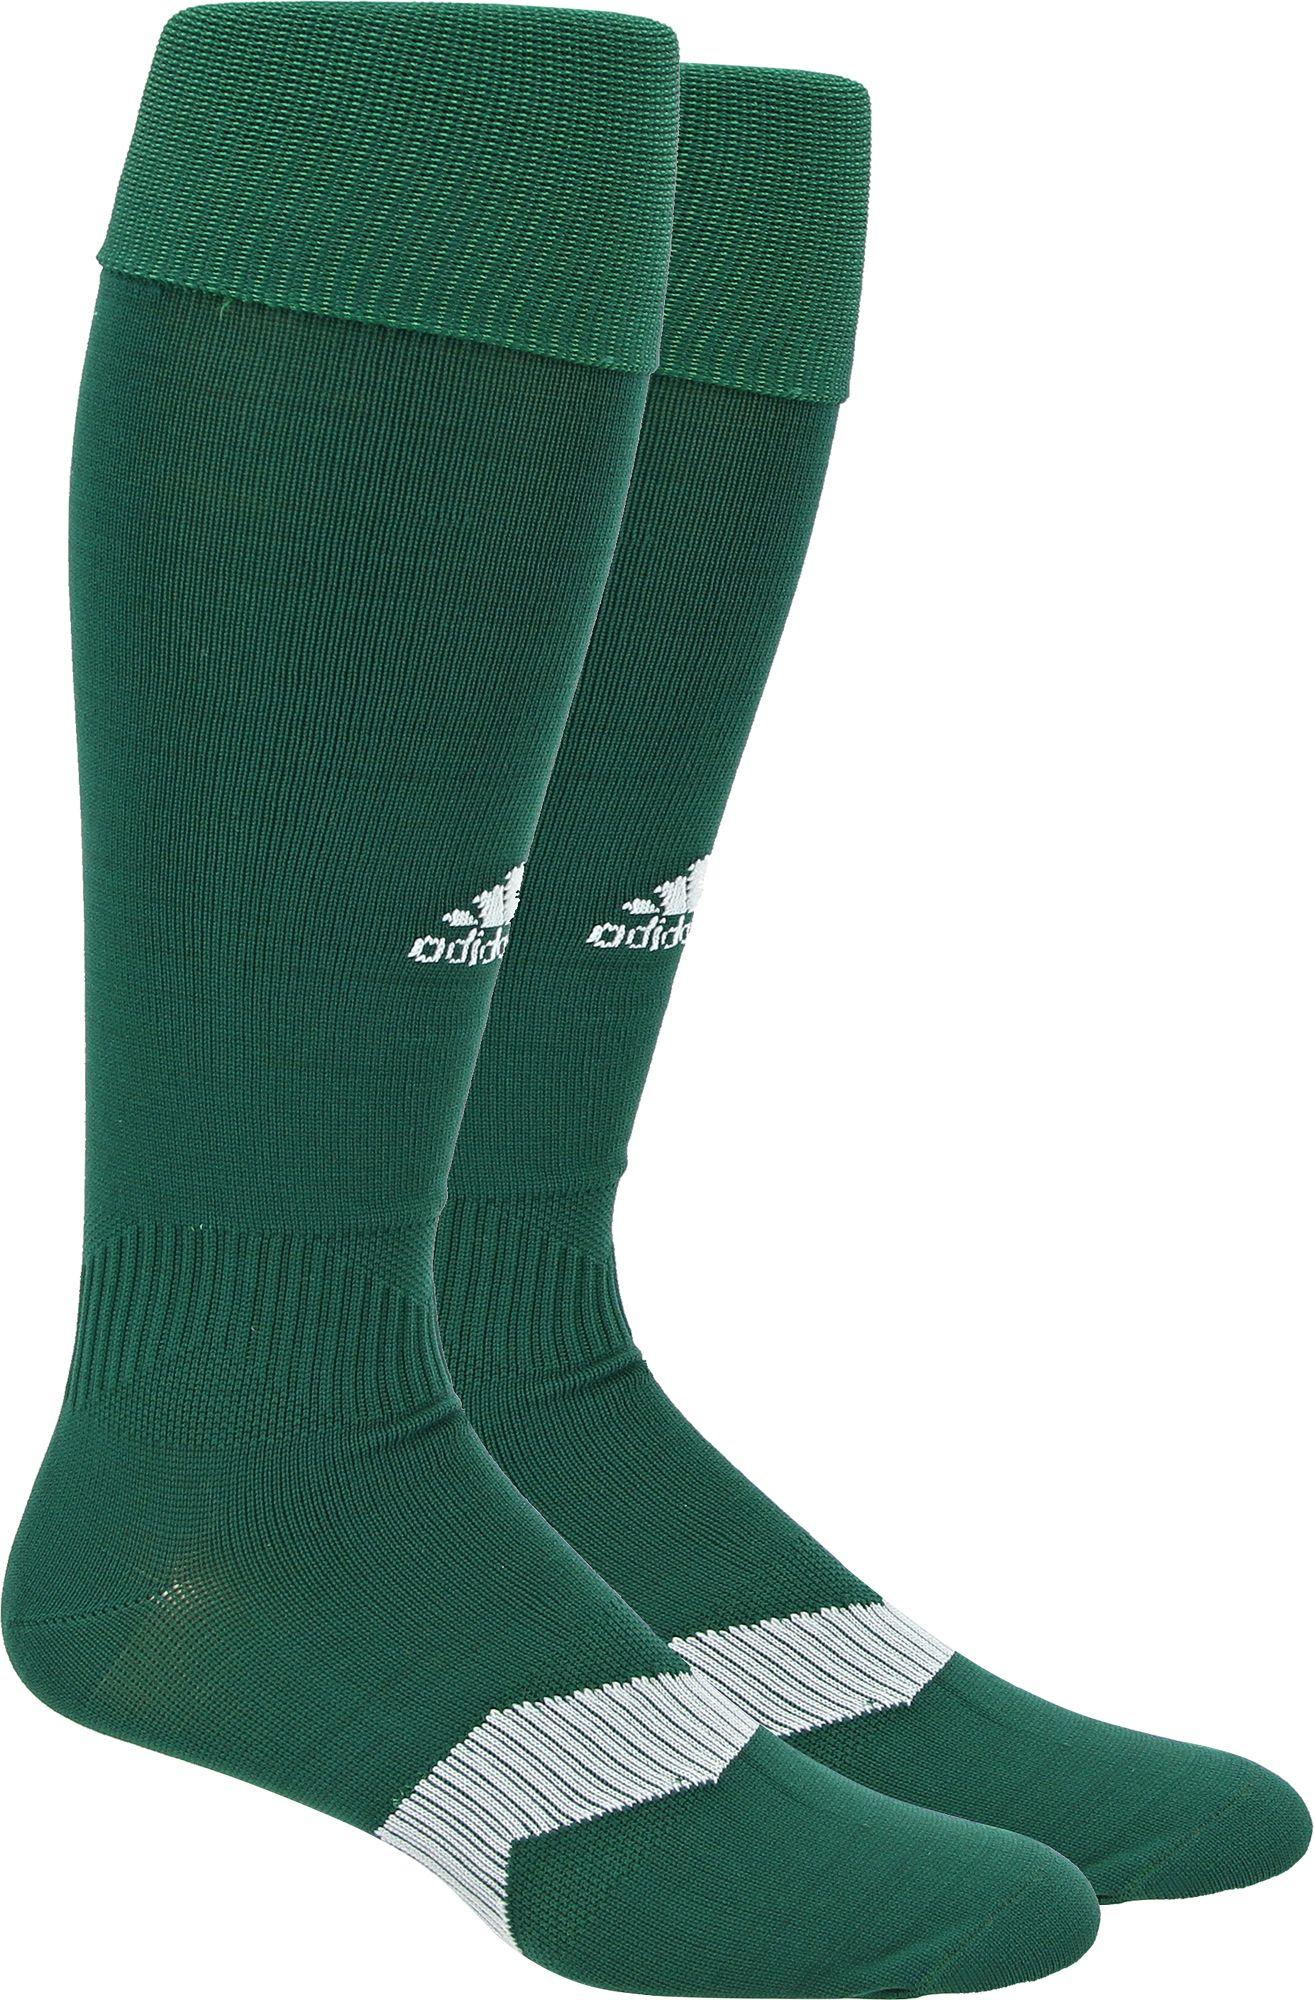 adidas black and green soccer socks